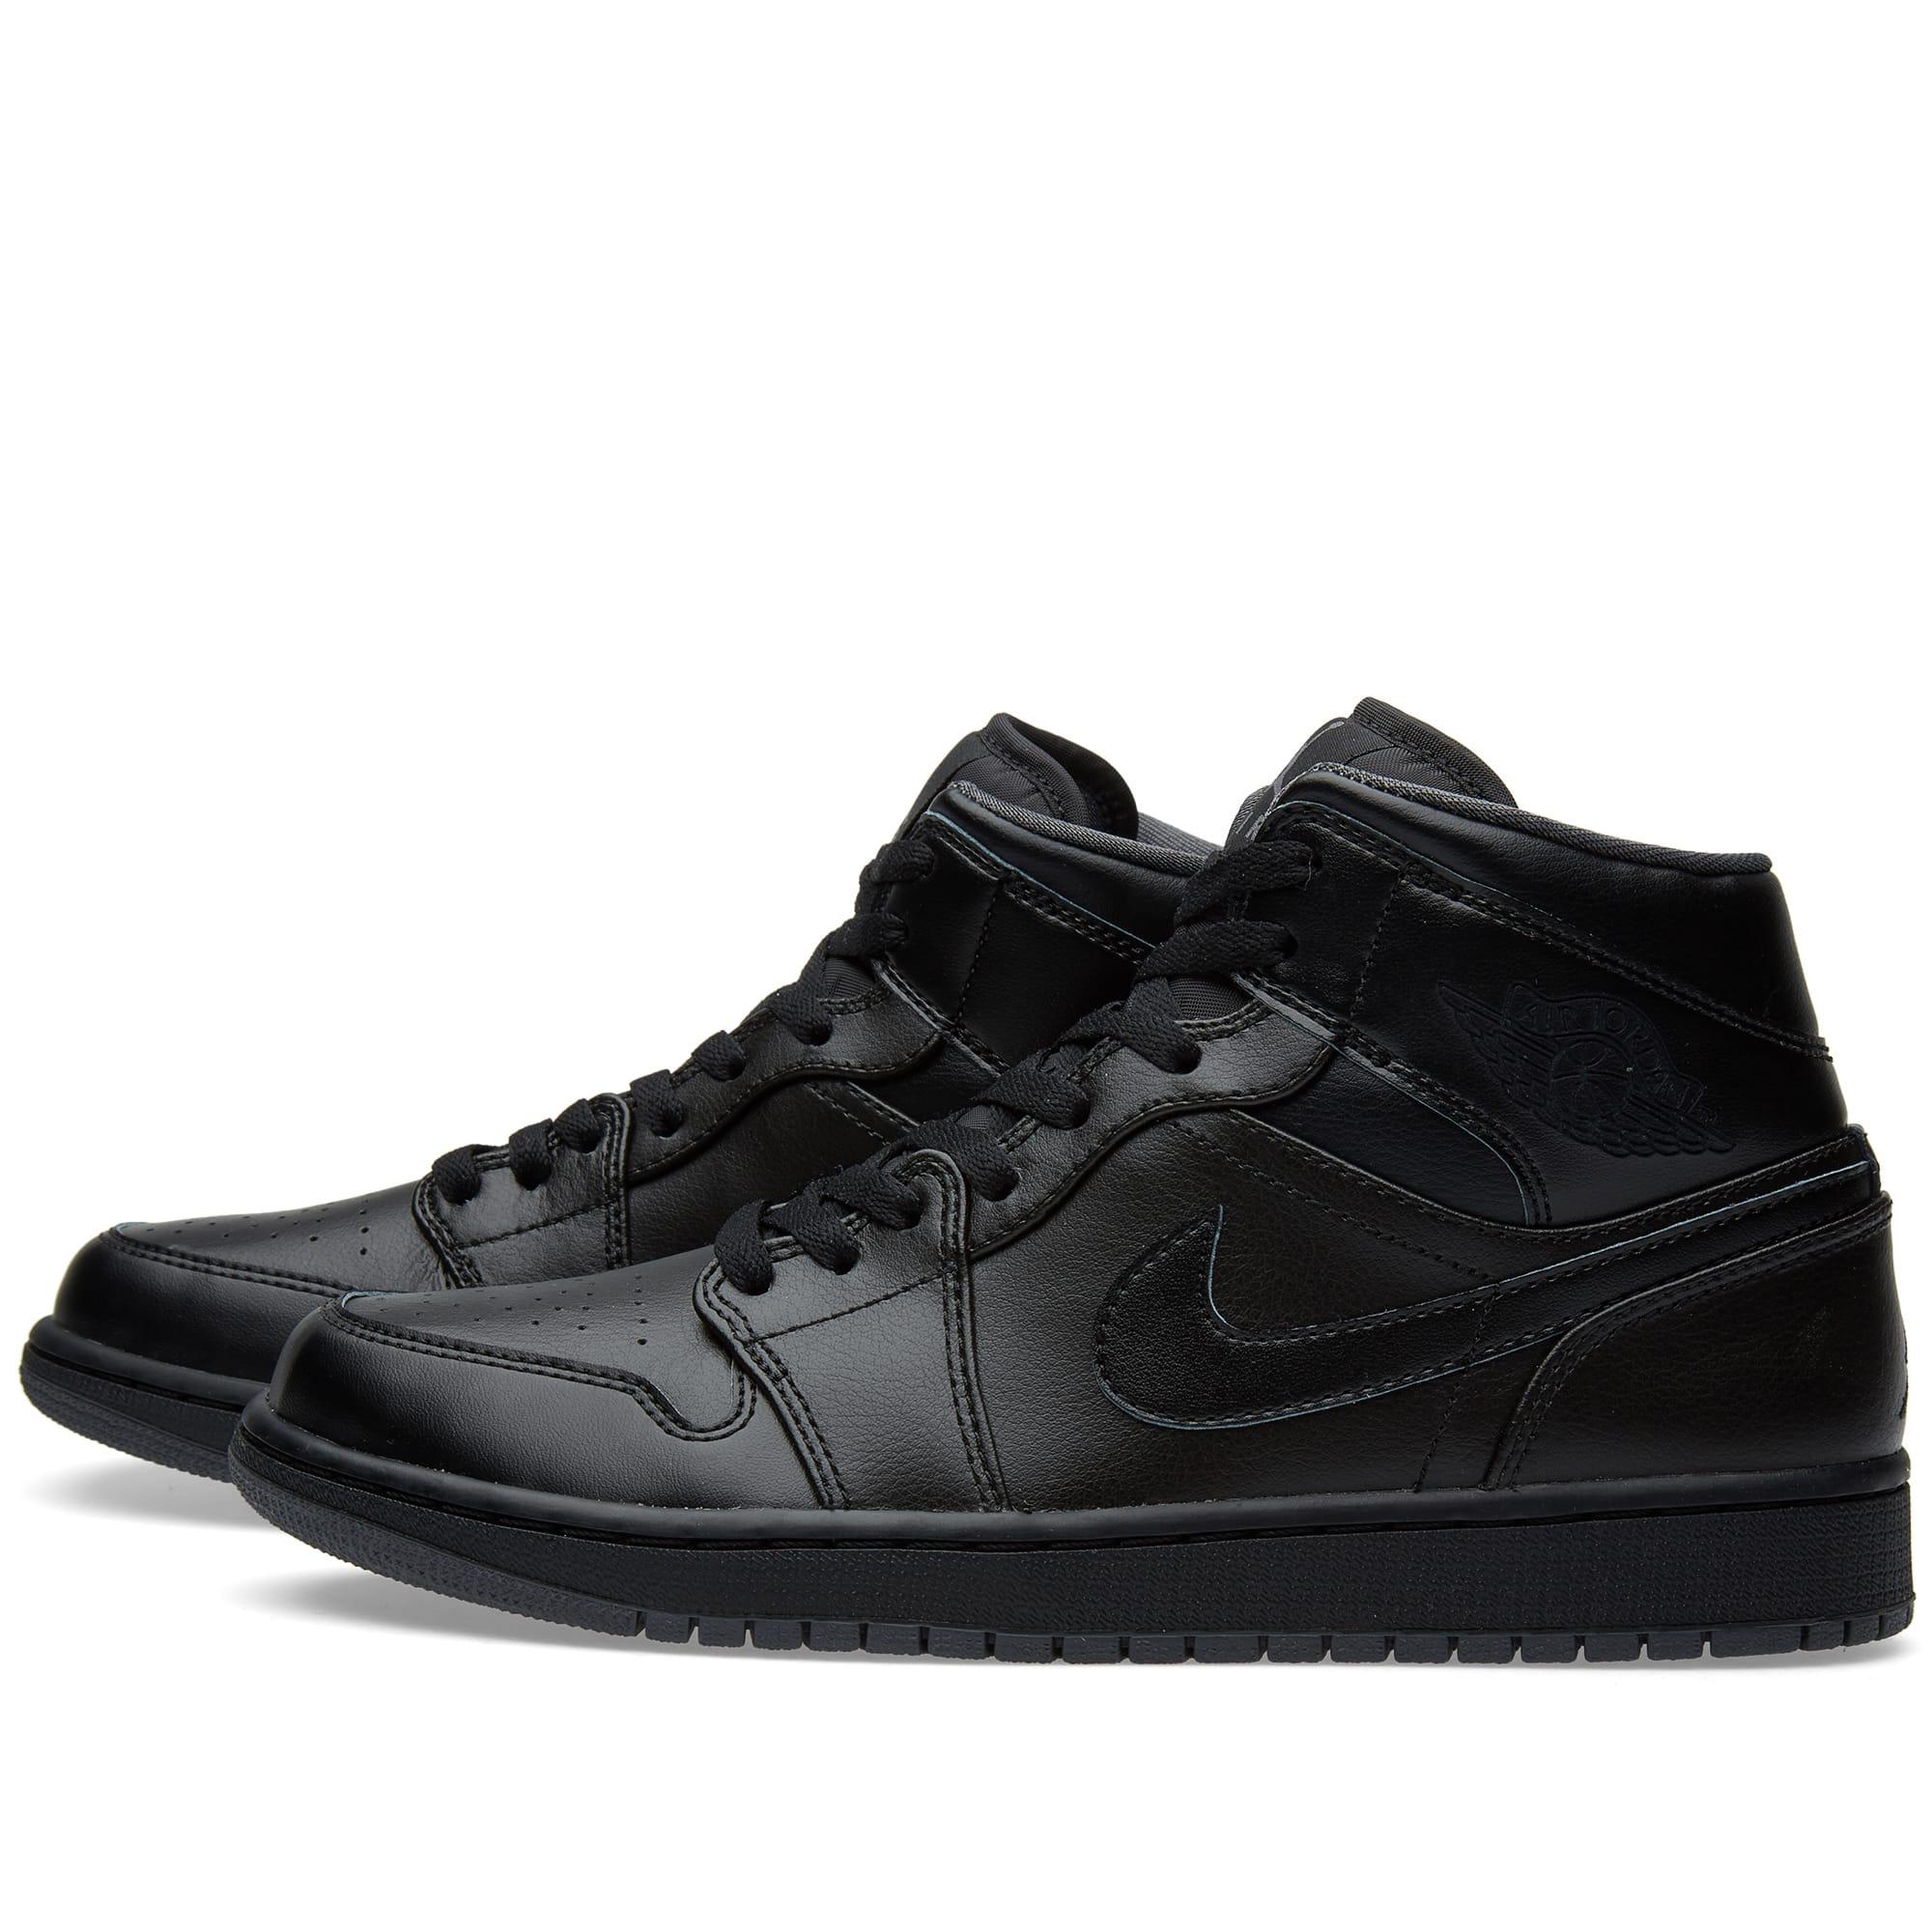 buy popular e9f37 d85b3 Nike Air Jordan 1 Mid Black   END.